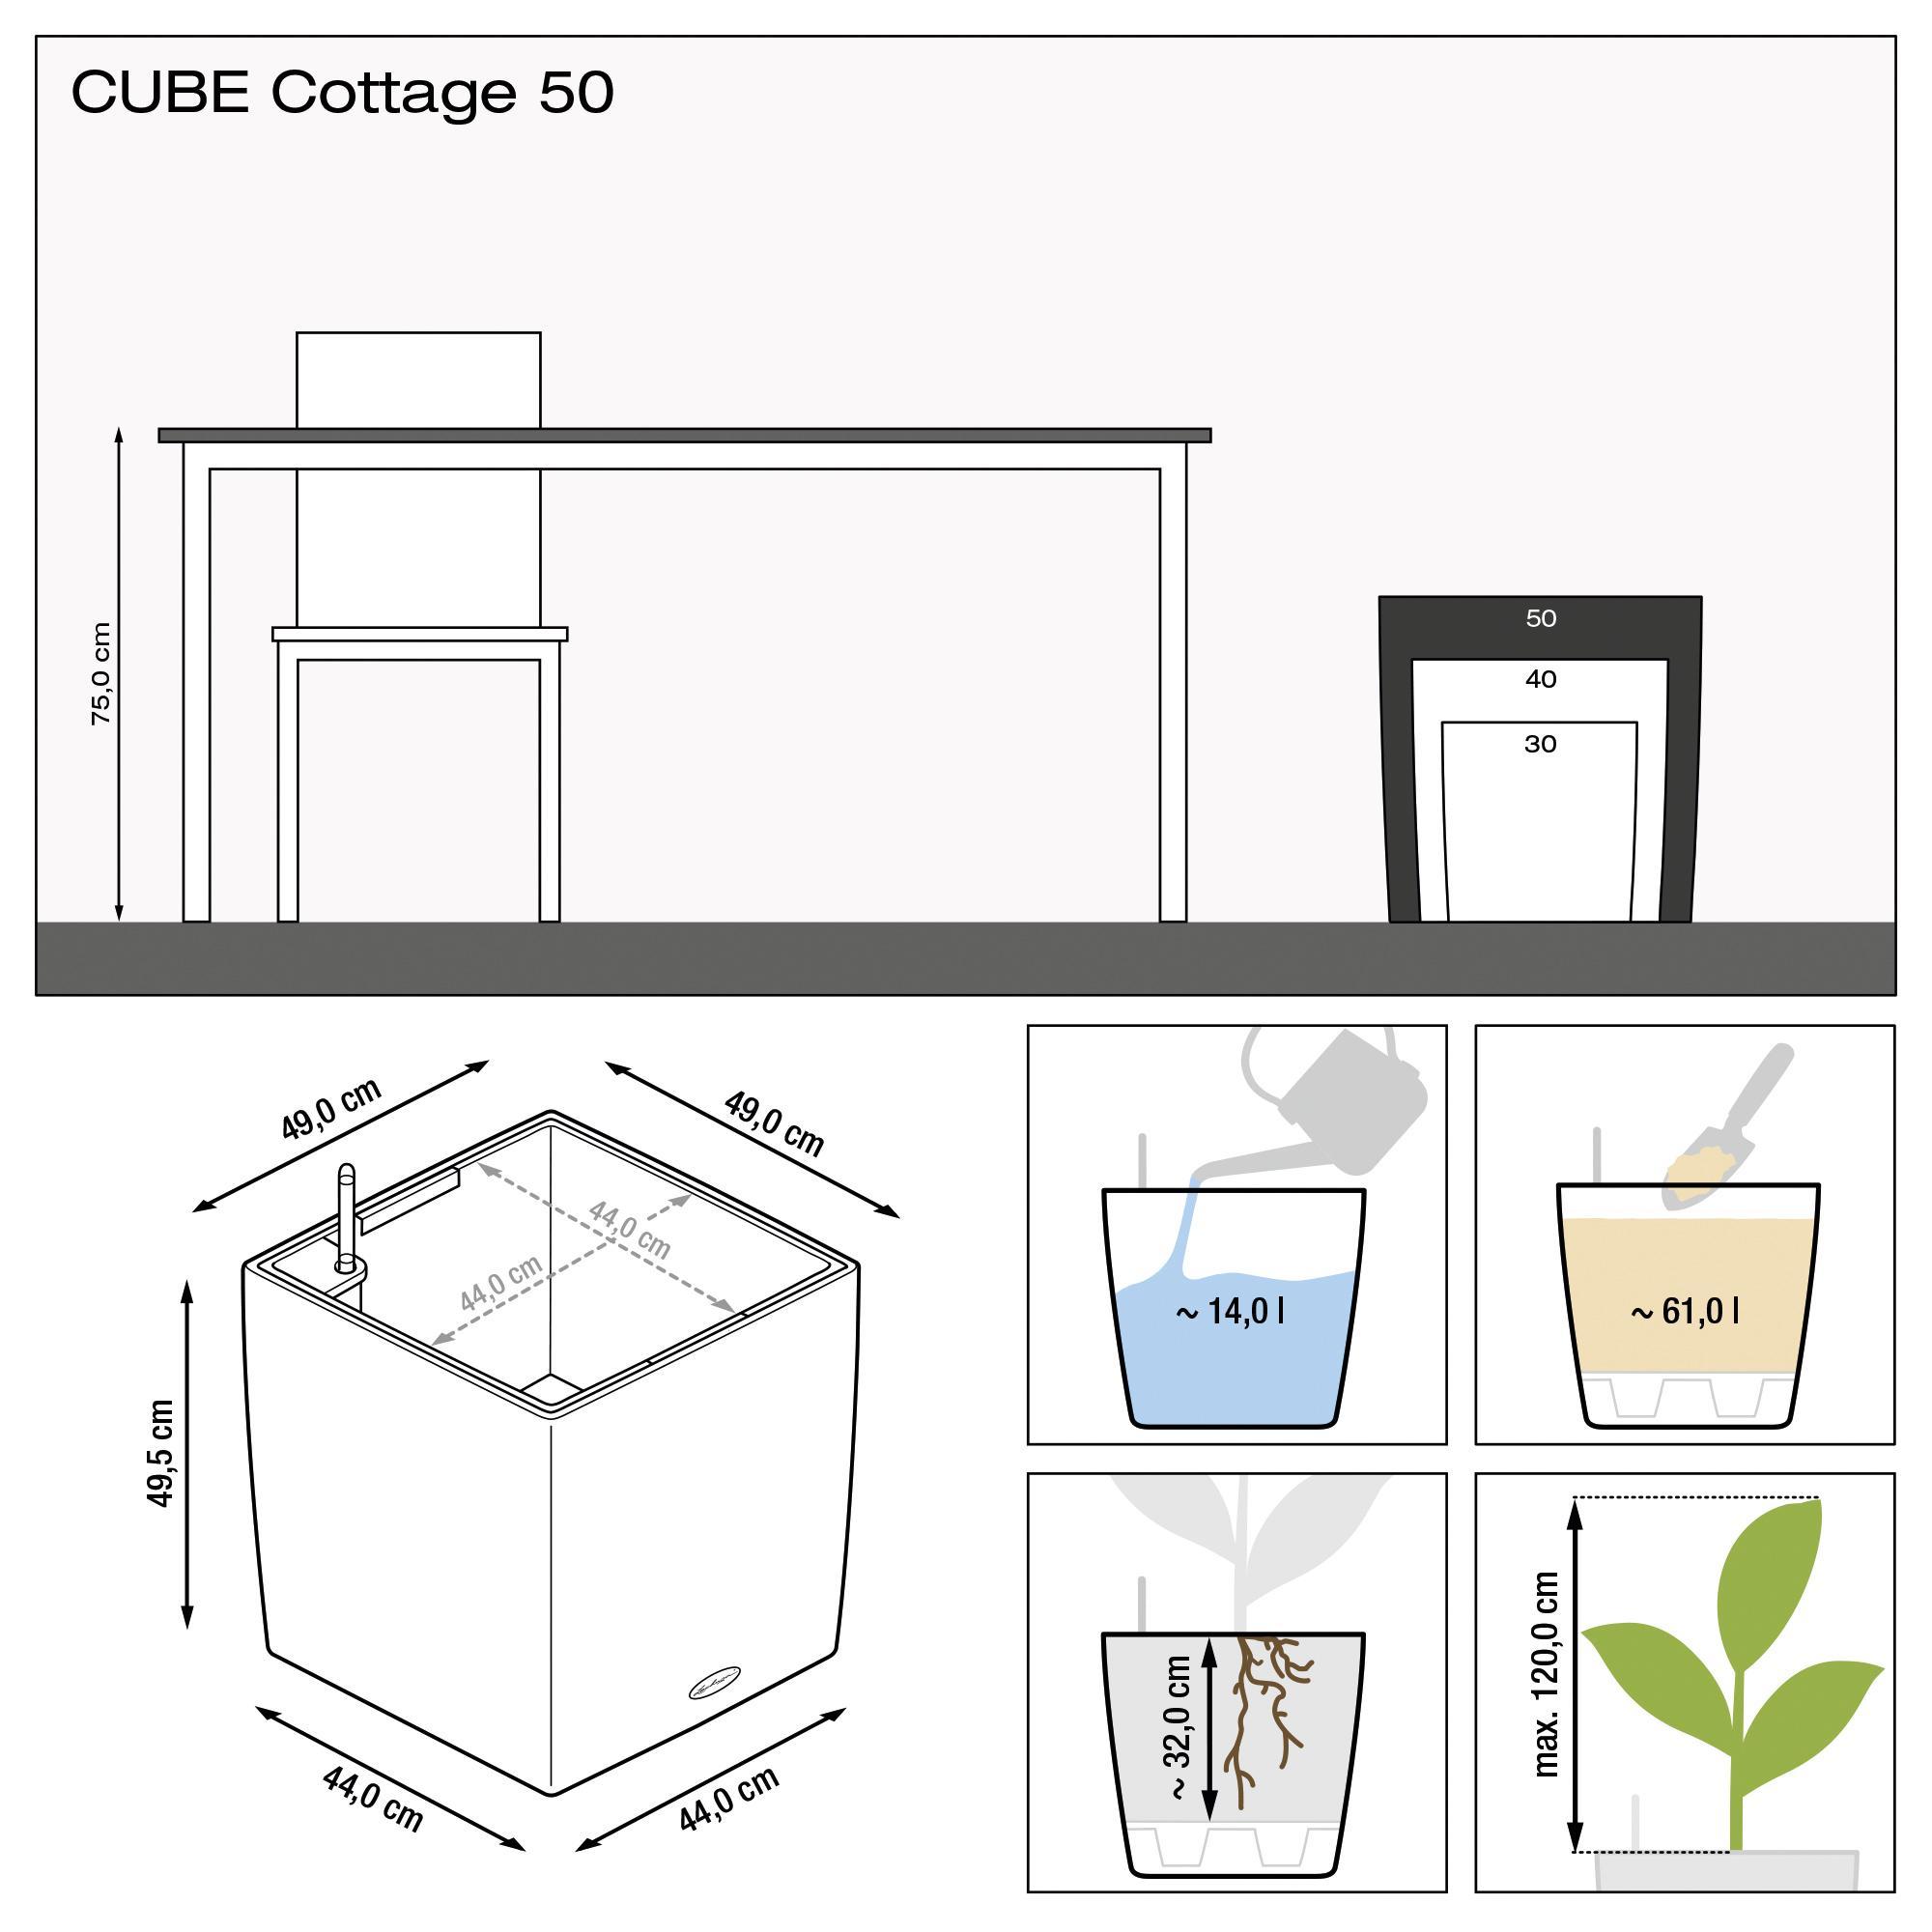 le_cube-cottage50_product_addi_nz